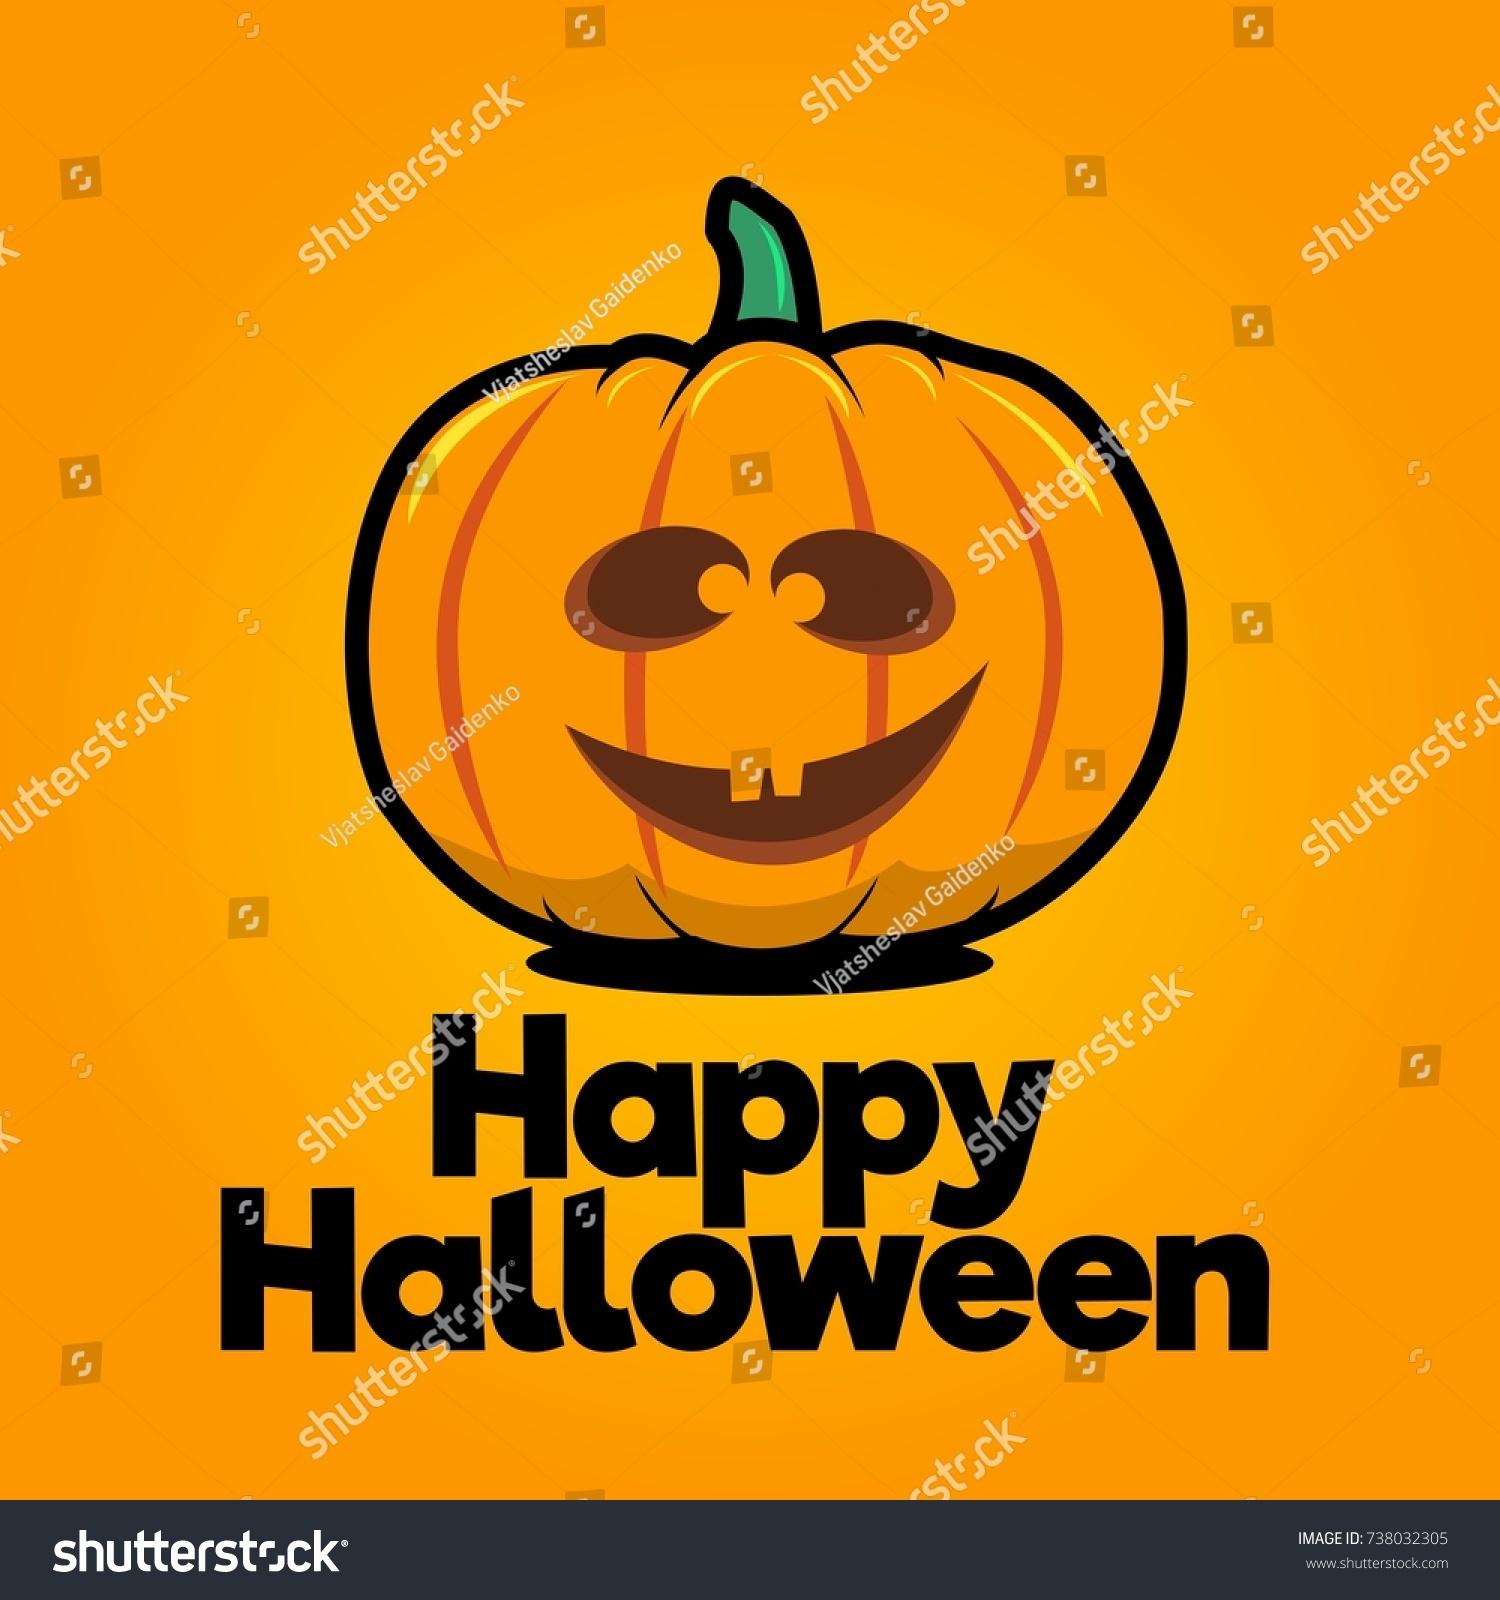 goofy halloween pumpkin vector happy halloween text on a bright orange background - Goofy Halloween Pictures